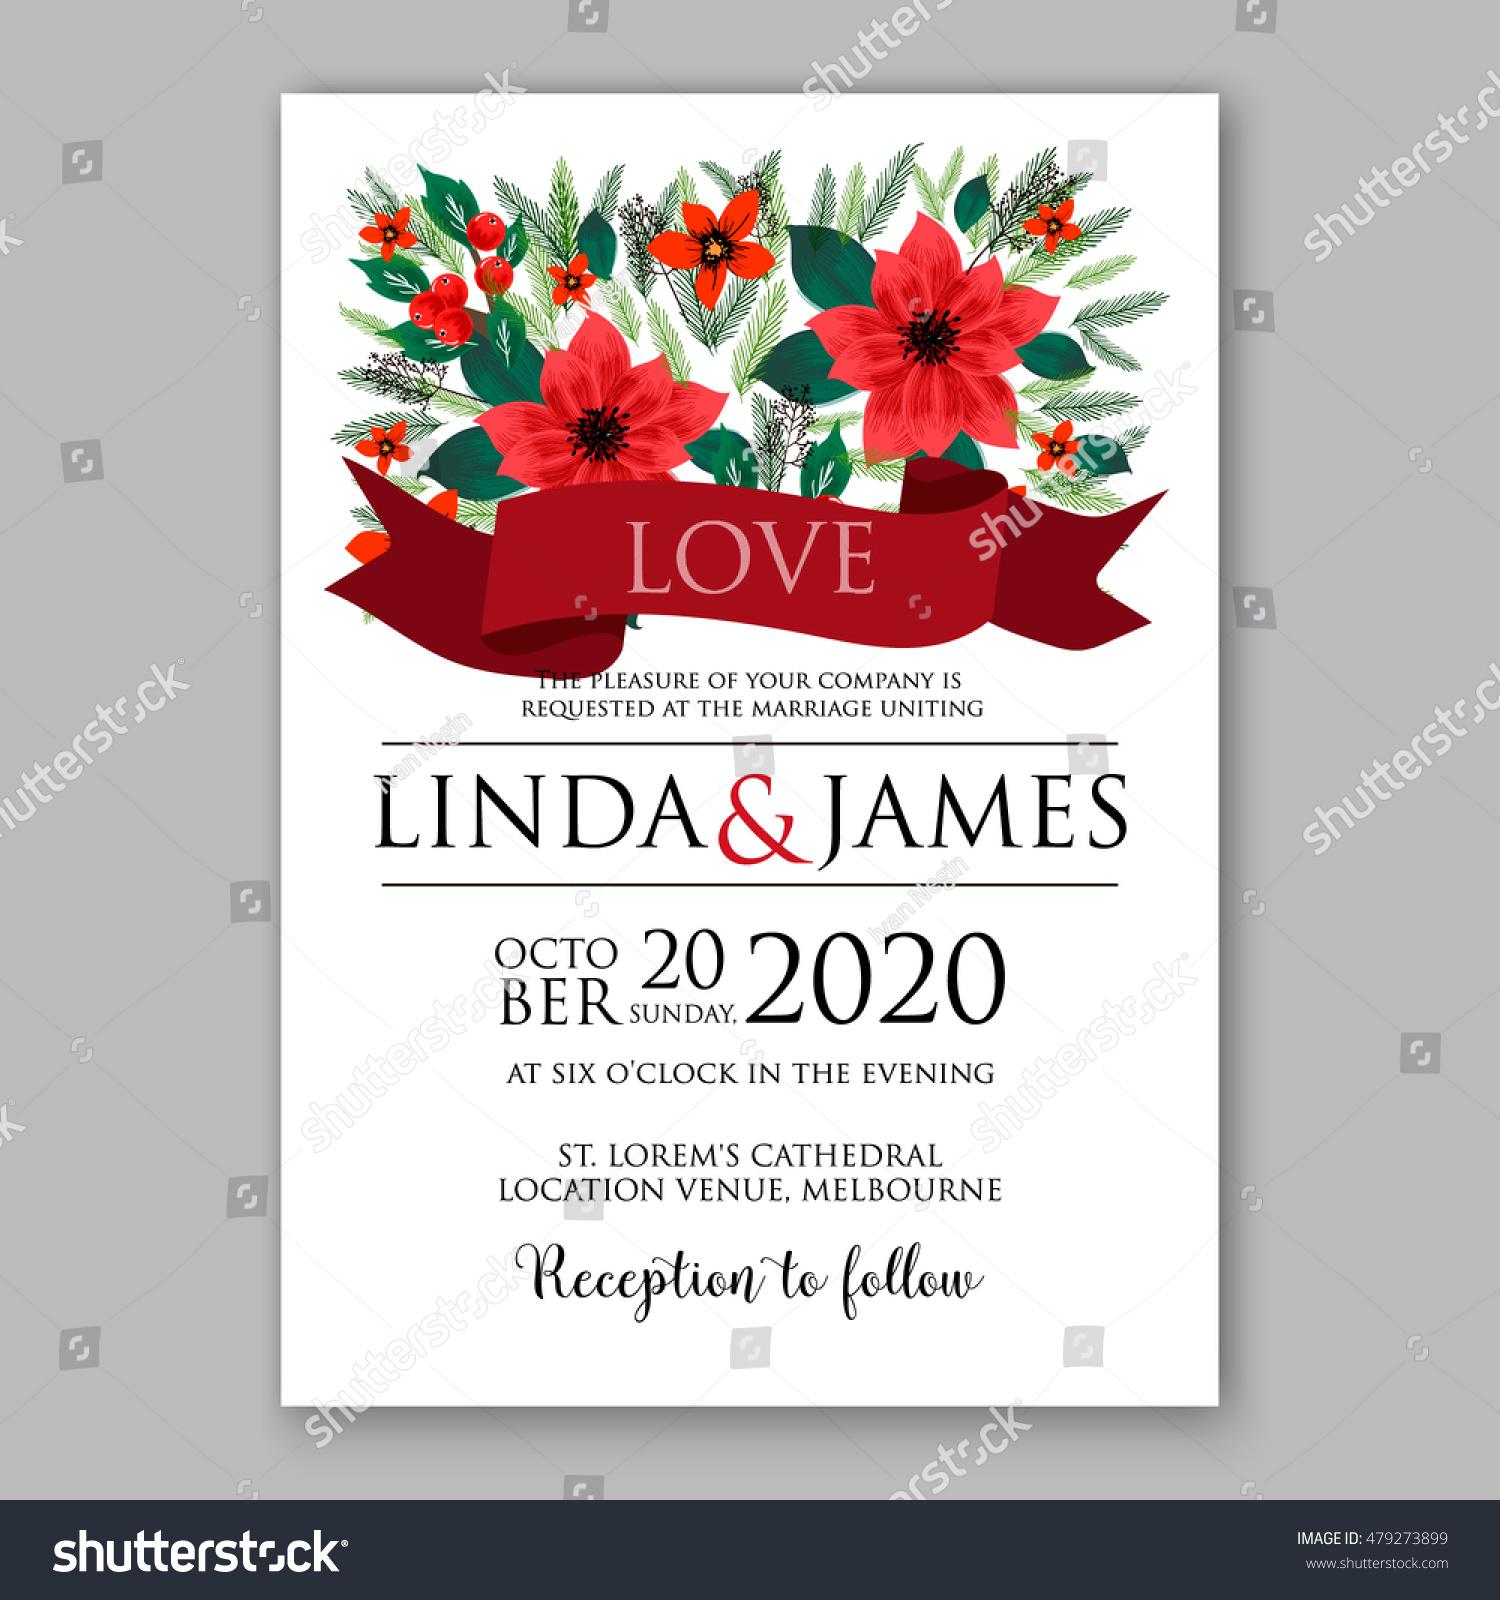 Modern Wedding Invitations Evening Reception Inspiration ...